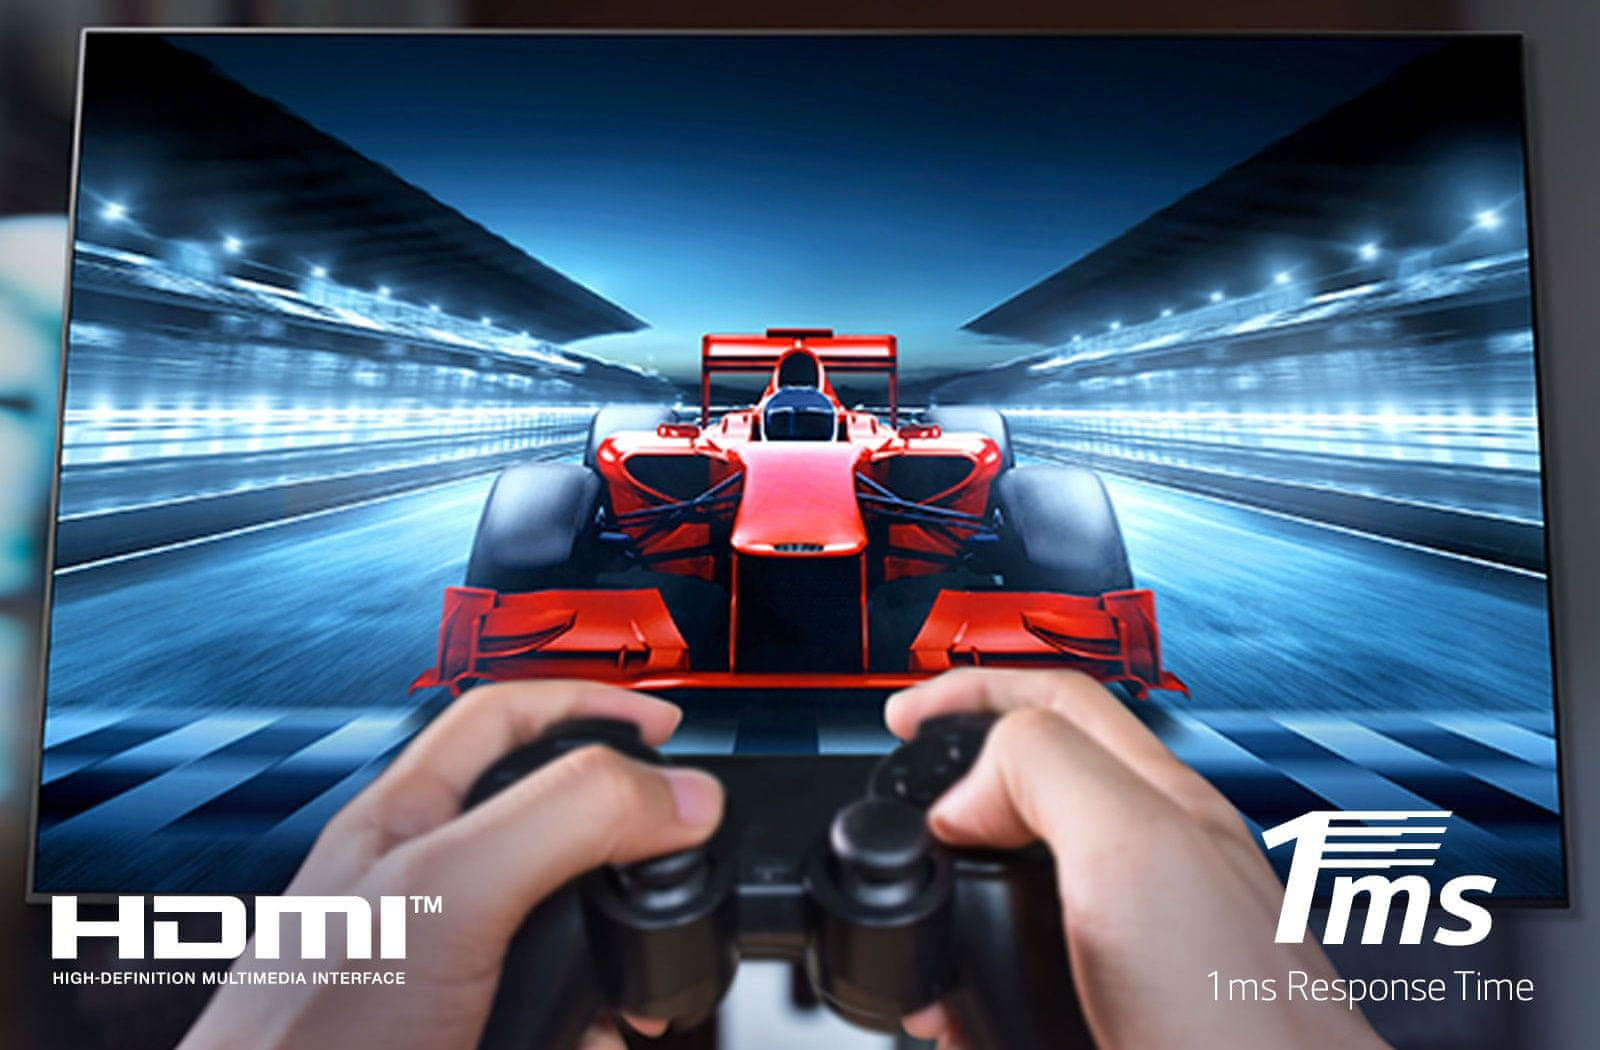 LG TV televízió NANOCELL 4K 2021 freesync premium allm auto low latency mode game optimizer válaszidő 1 ms